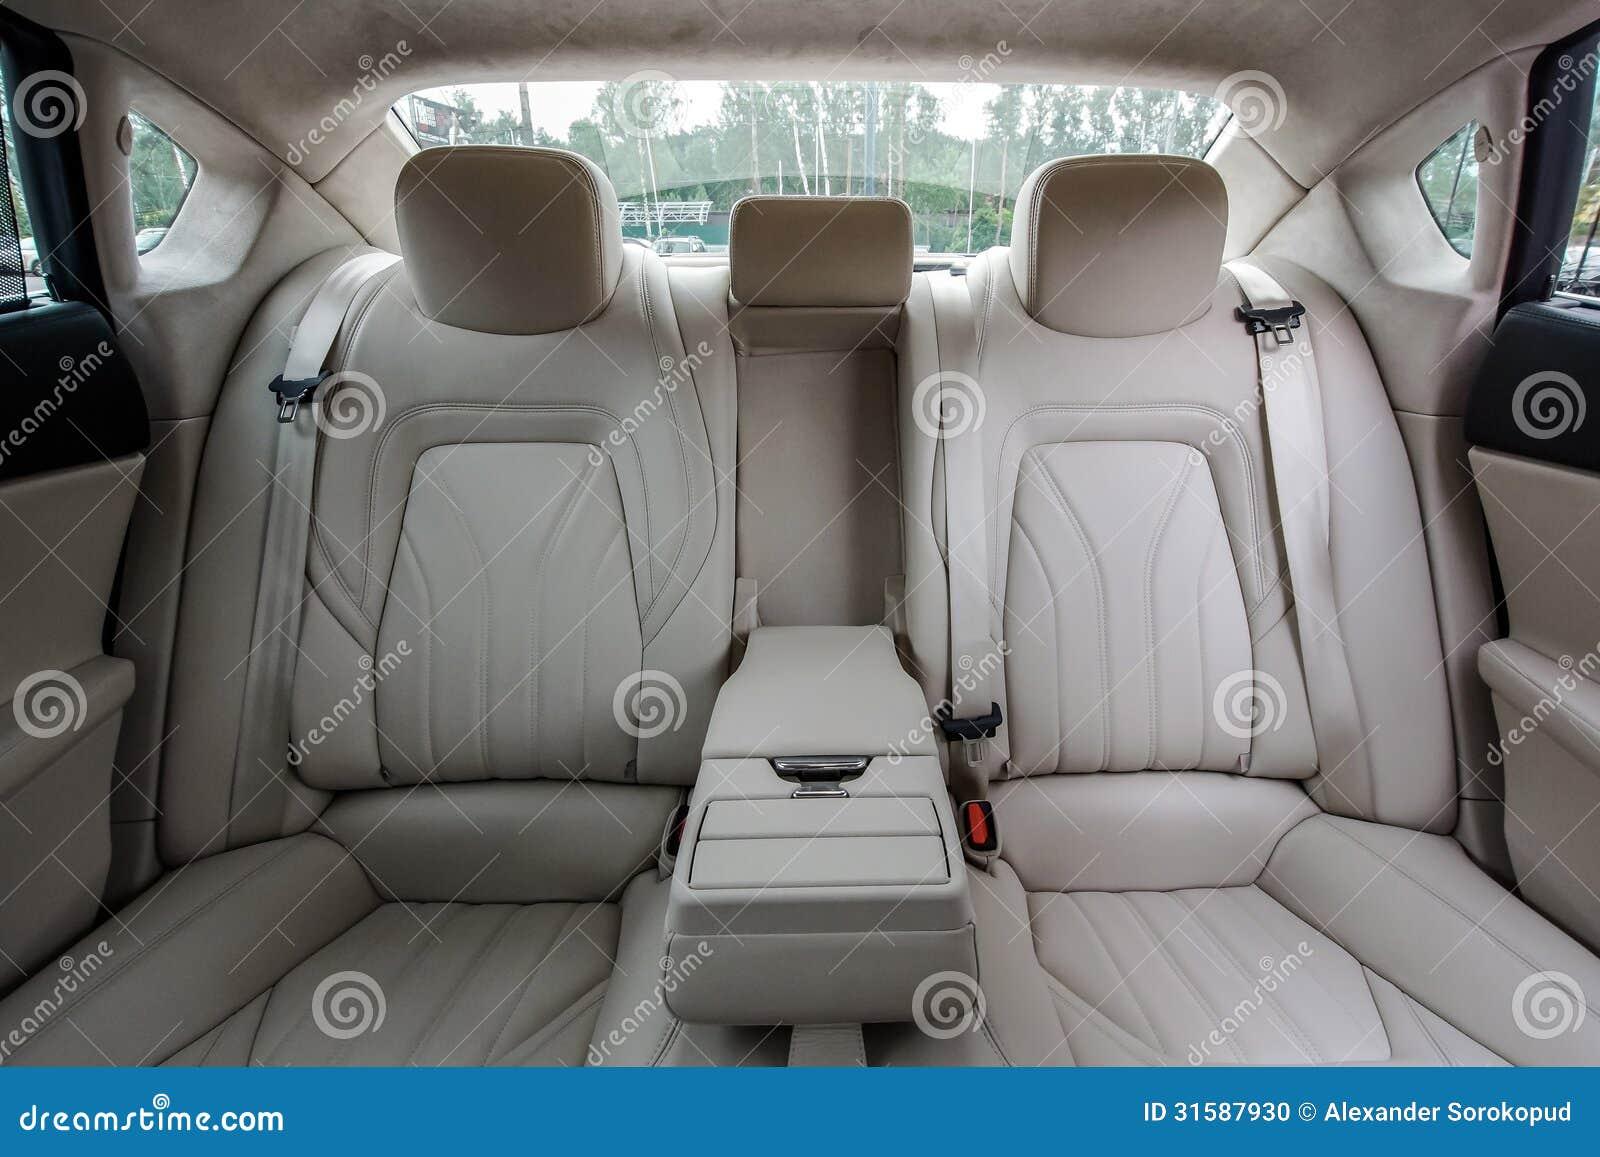 luxury car interior stock photo image 31587930. Black Bedroom Furniture Sets. Home Design Ideas